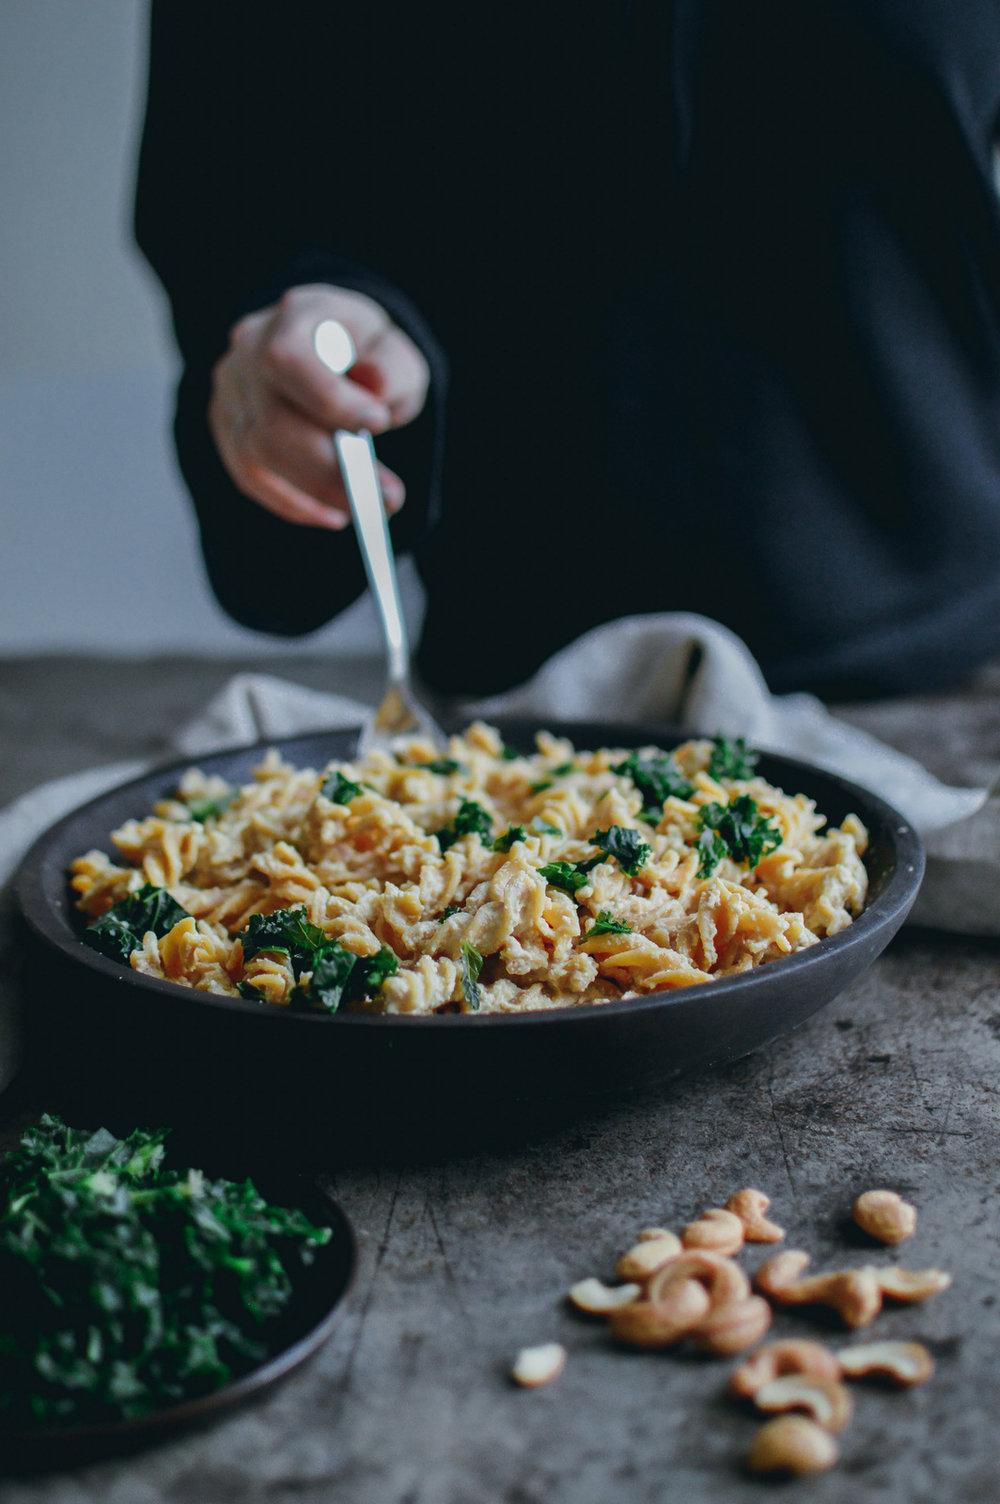 Glutenfree & Vegan Mac And Cheese | The Nordic Kitchen